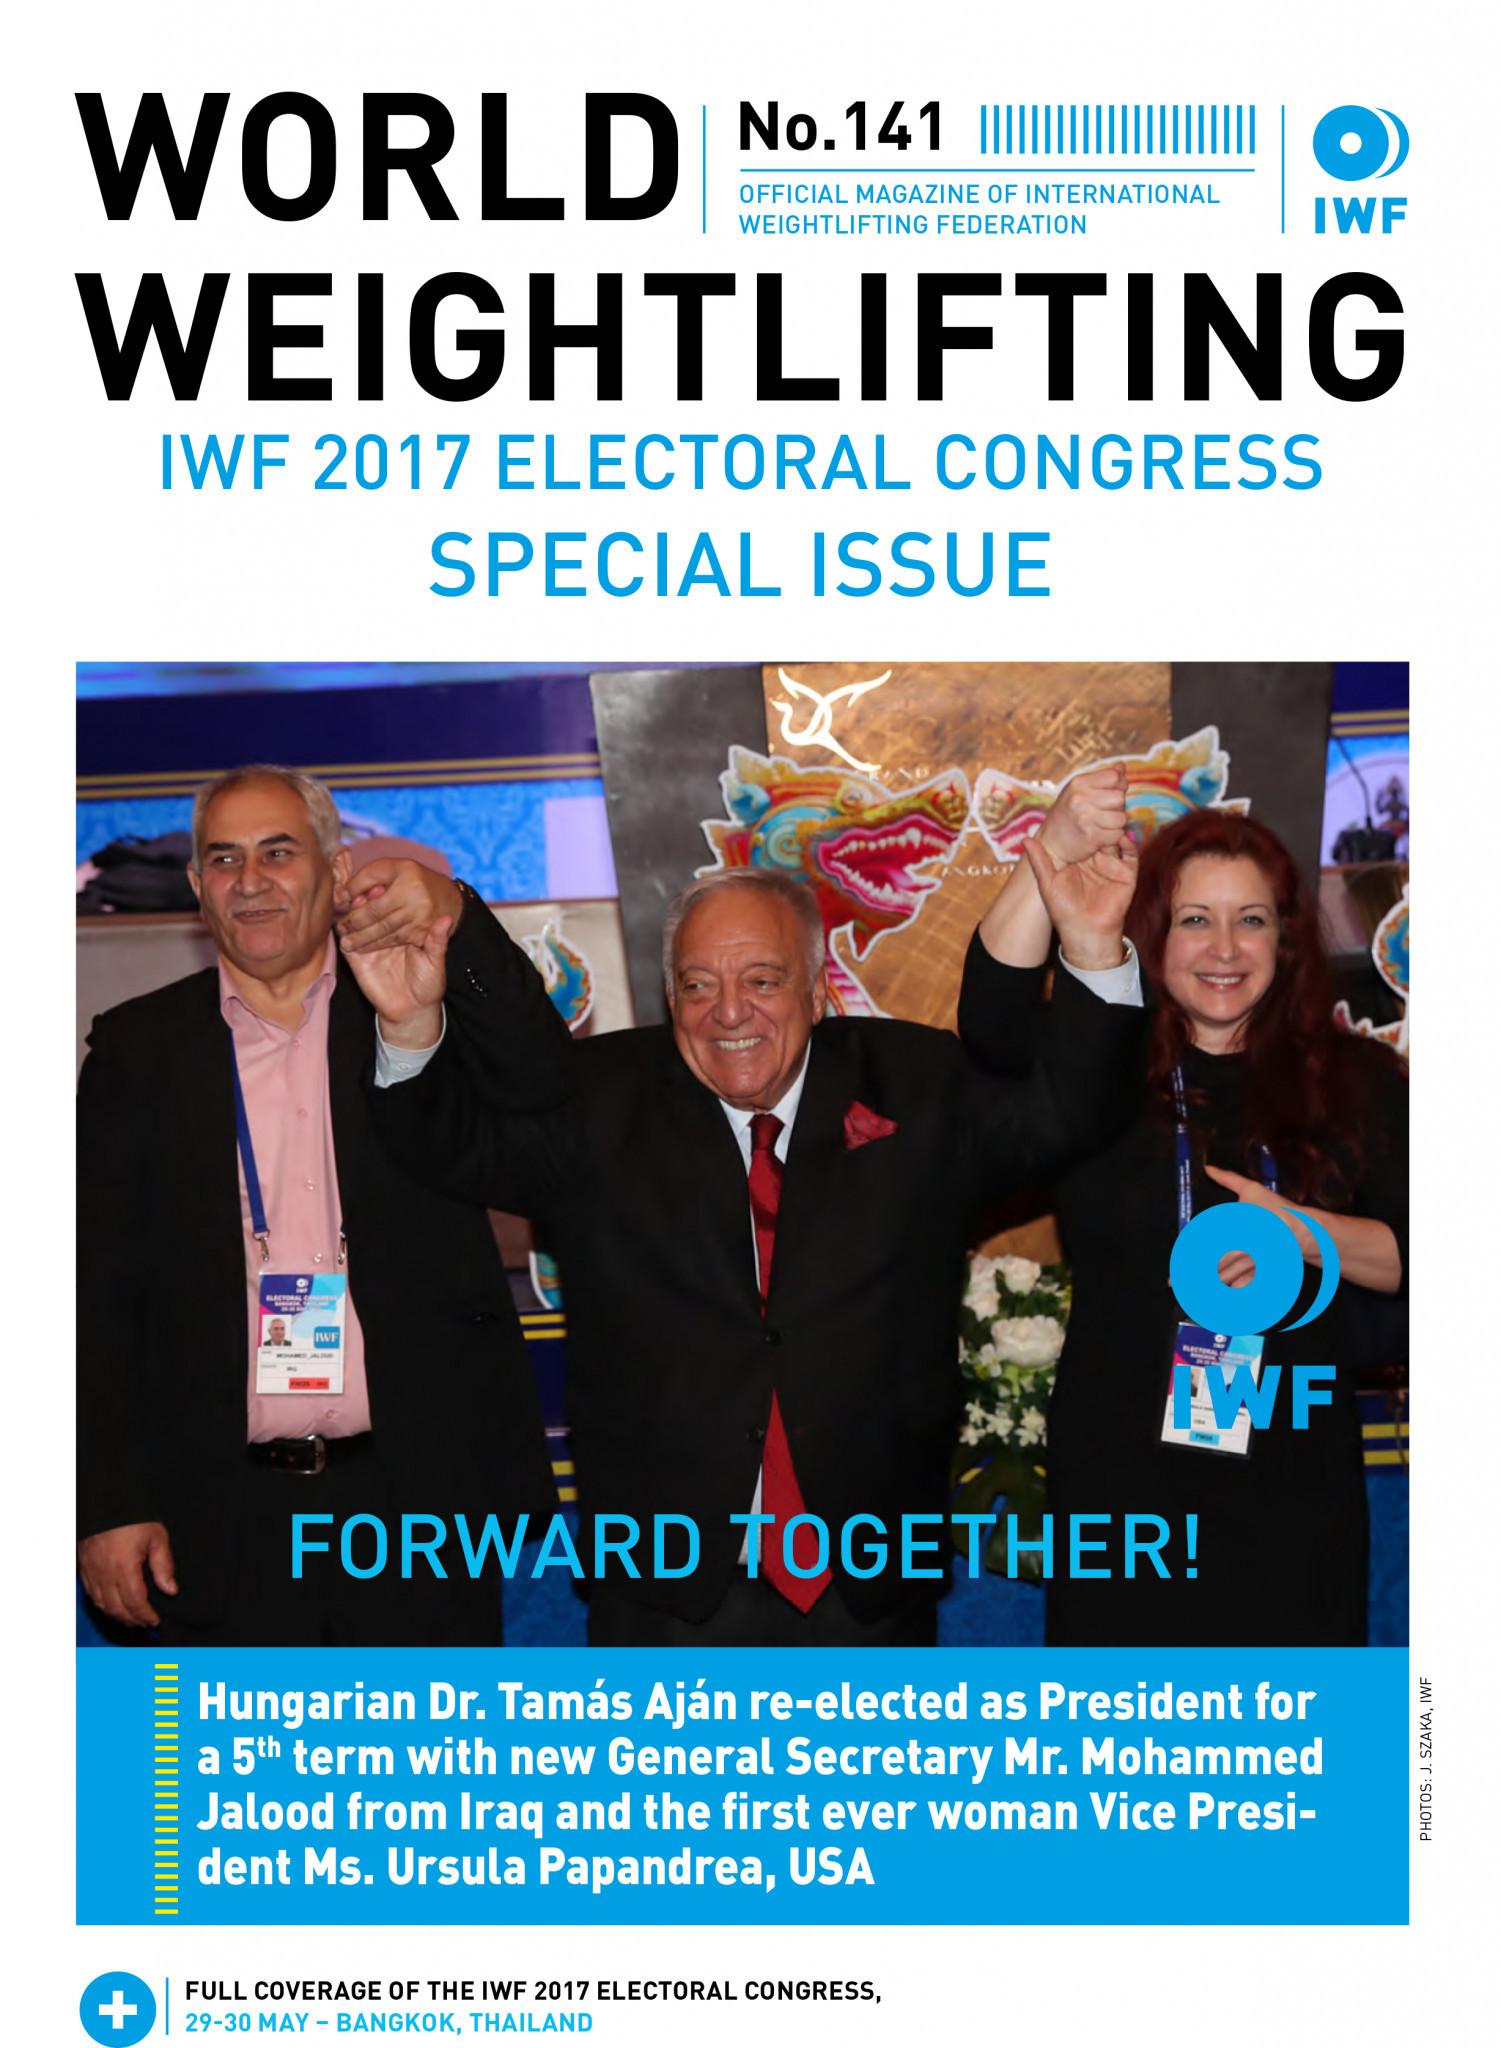 World Weightlifting Magazine No. 141